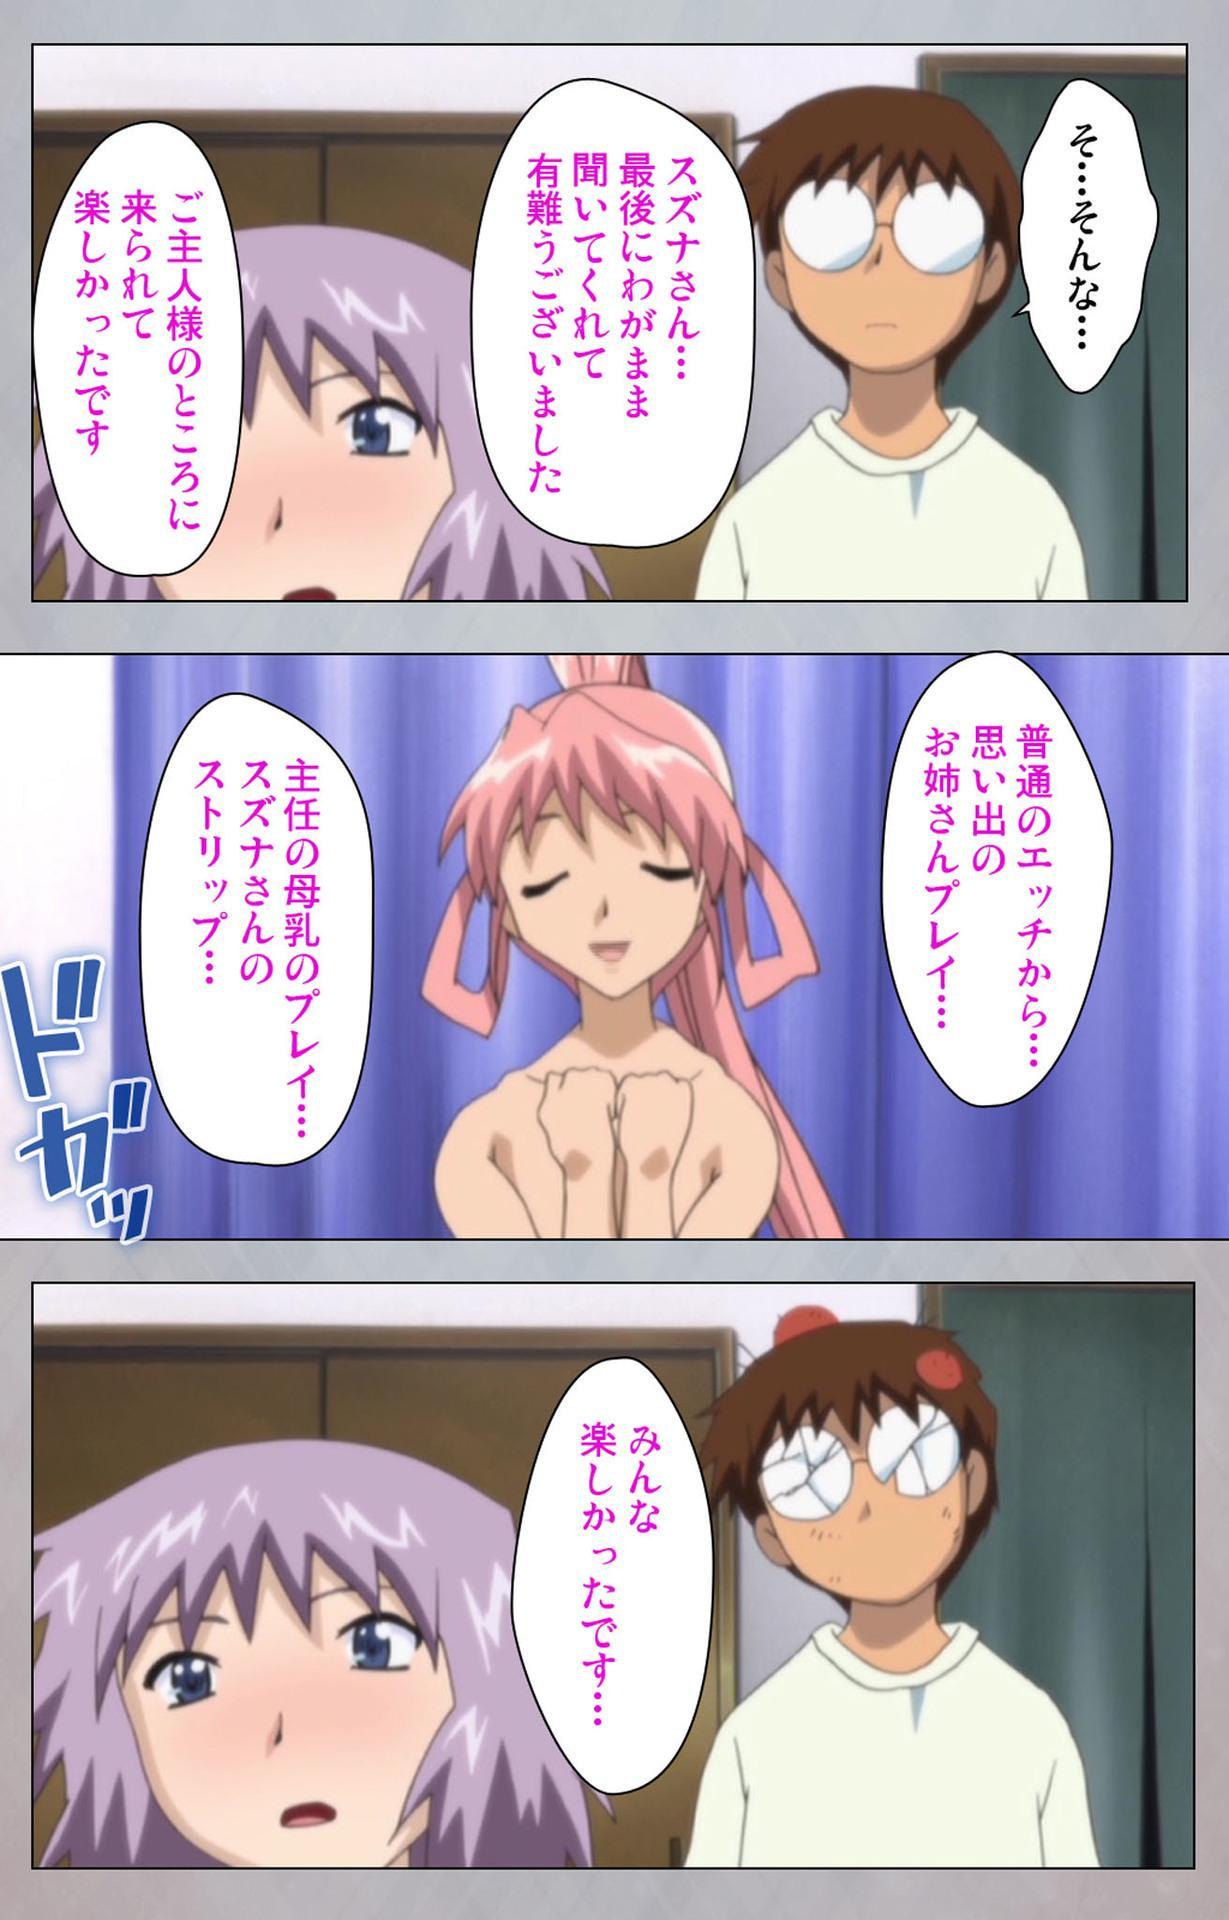 [Digital Works] [Full Color Seijin Ban] Sex Android ~Risou no Onna de Nuite yaru~ Kanzenban 239